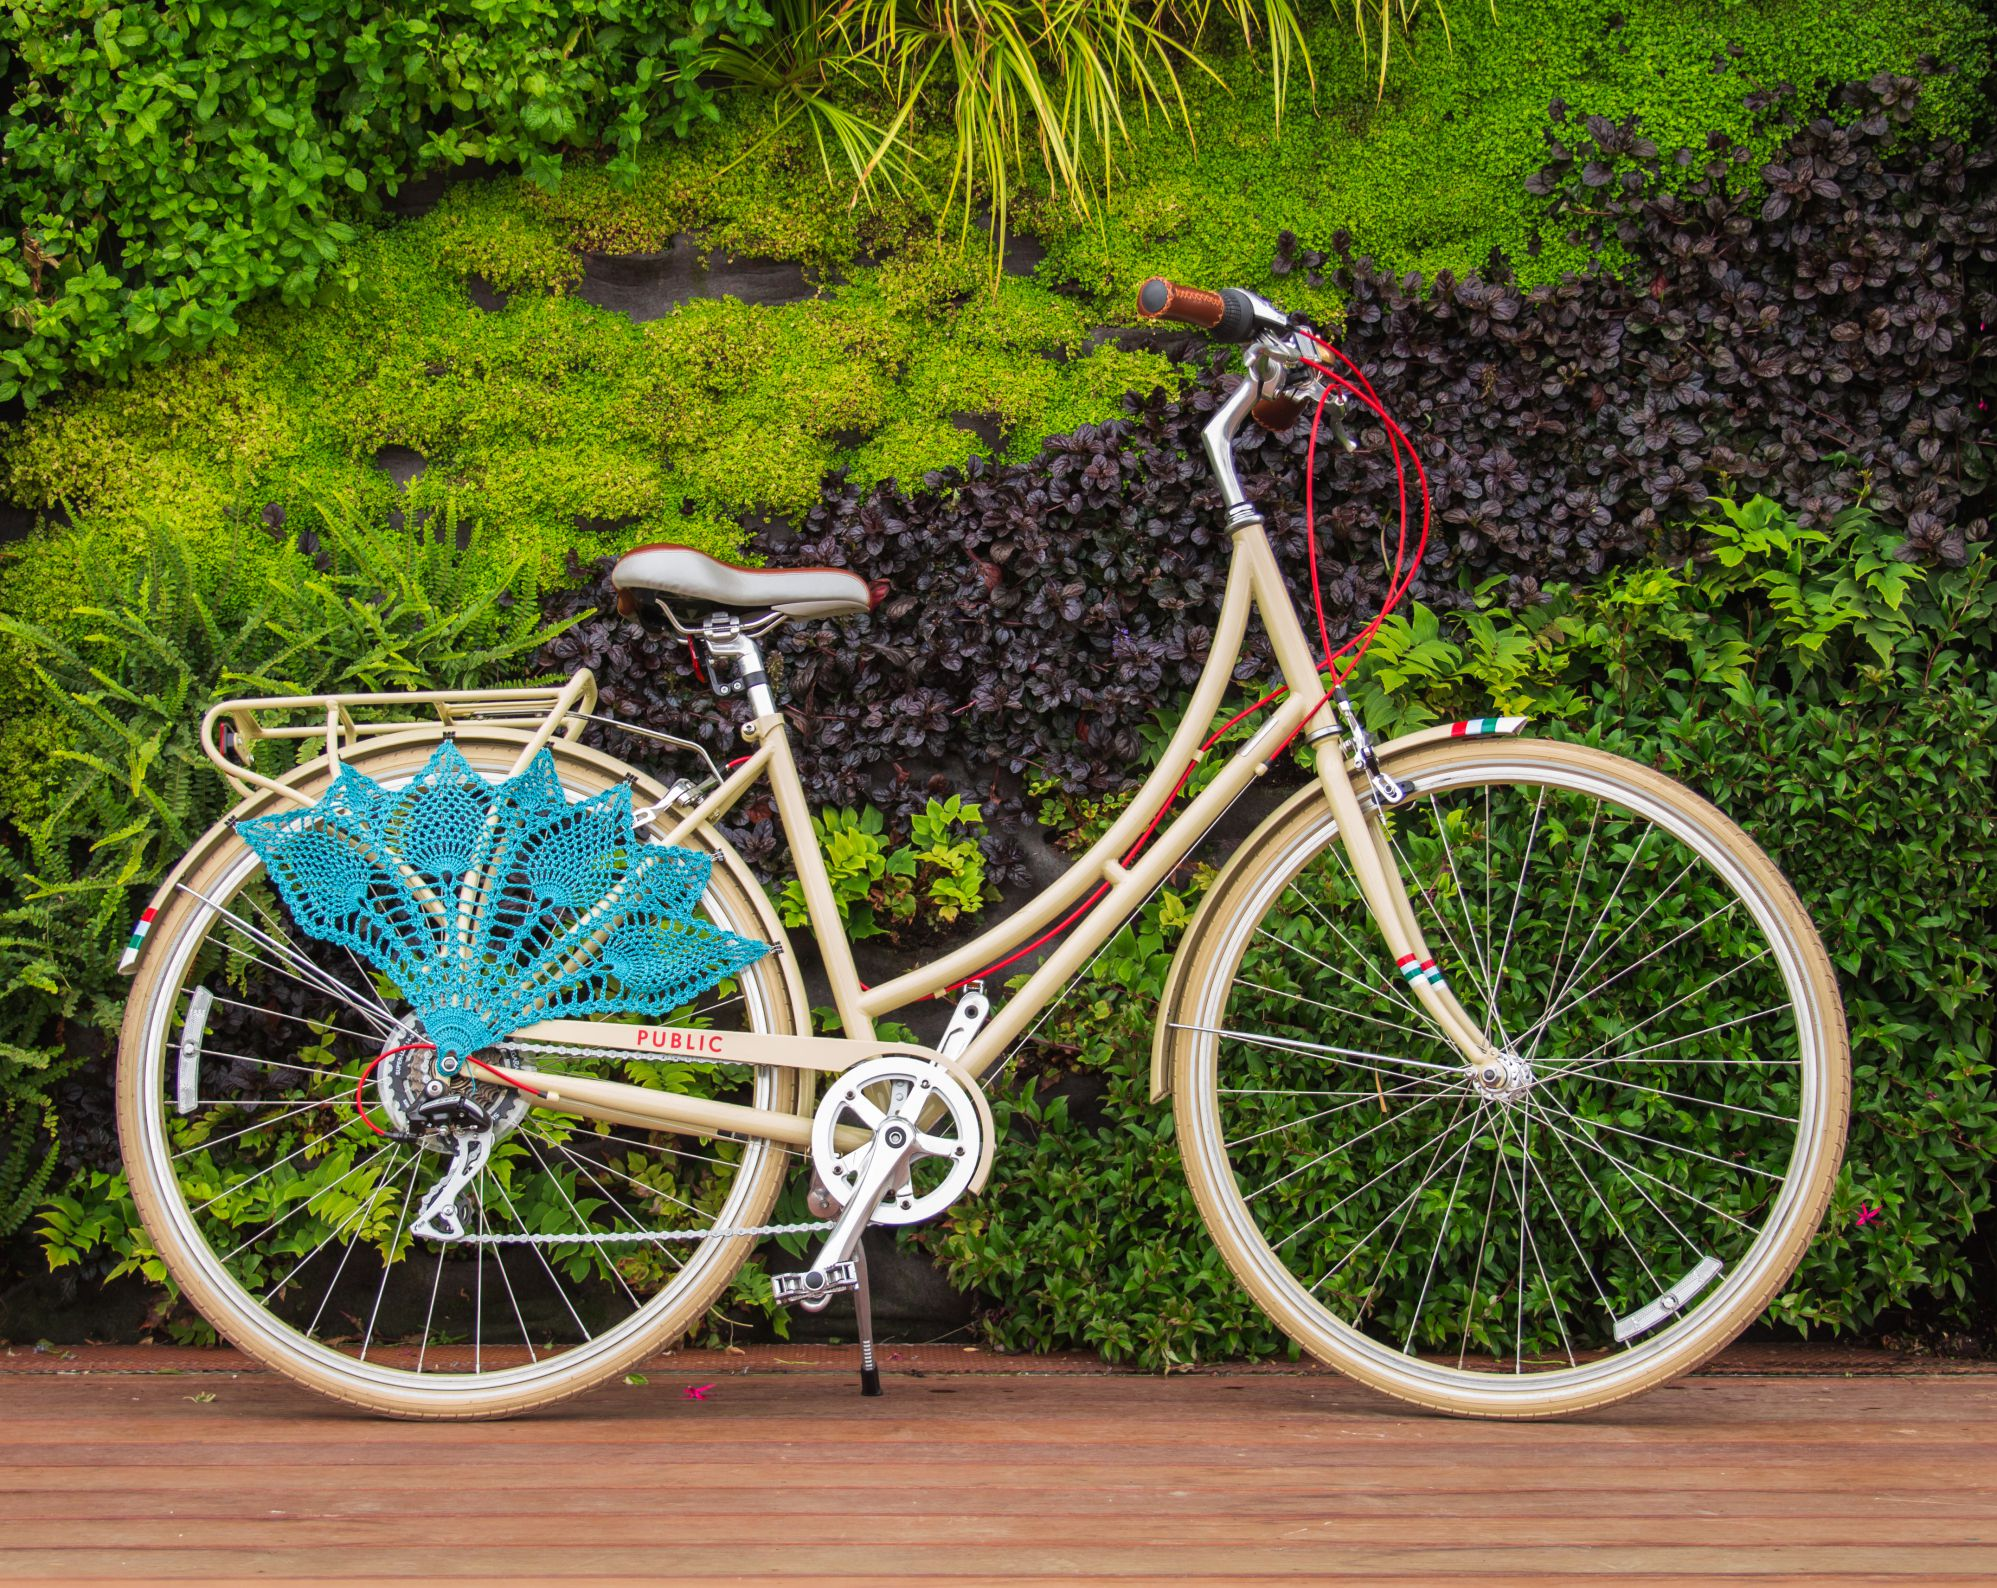 Pineapple Crochet Bicycle Skirt Guard